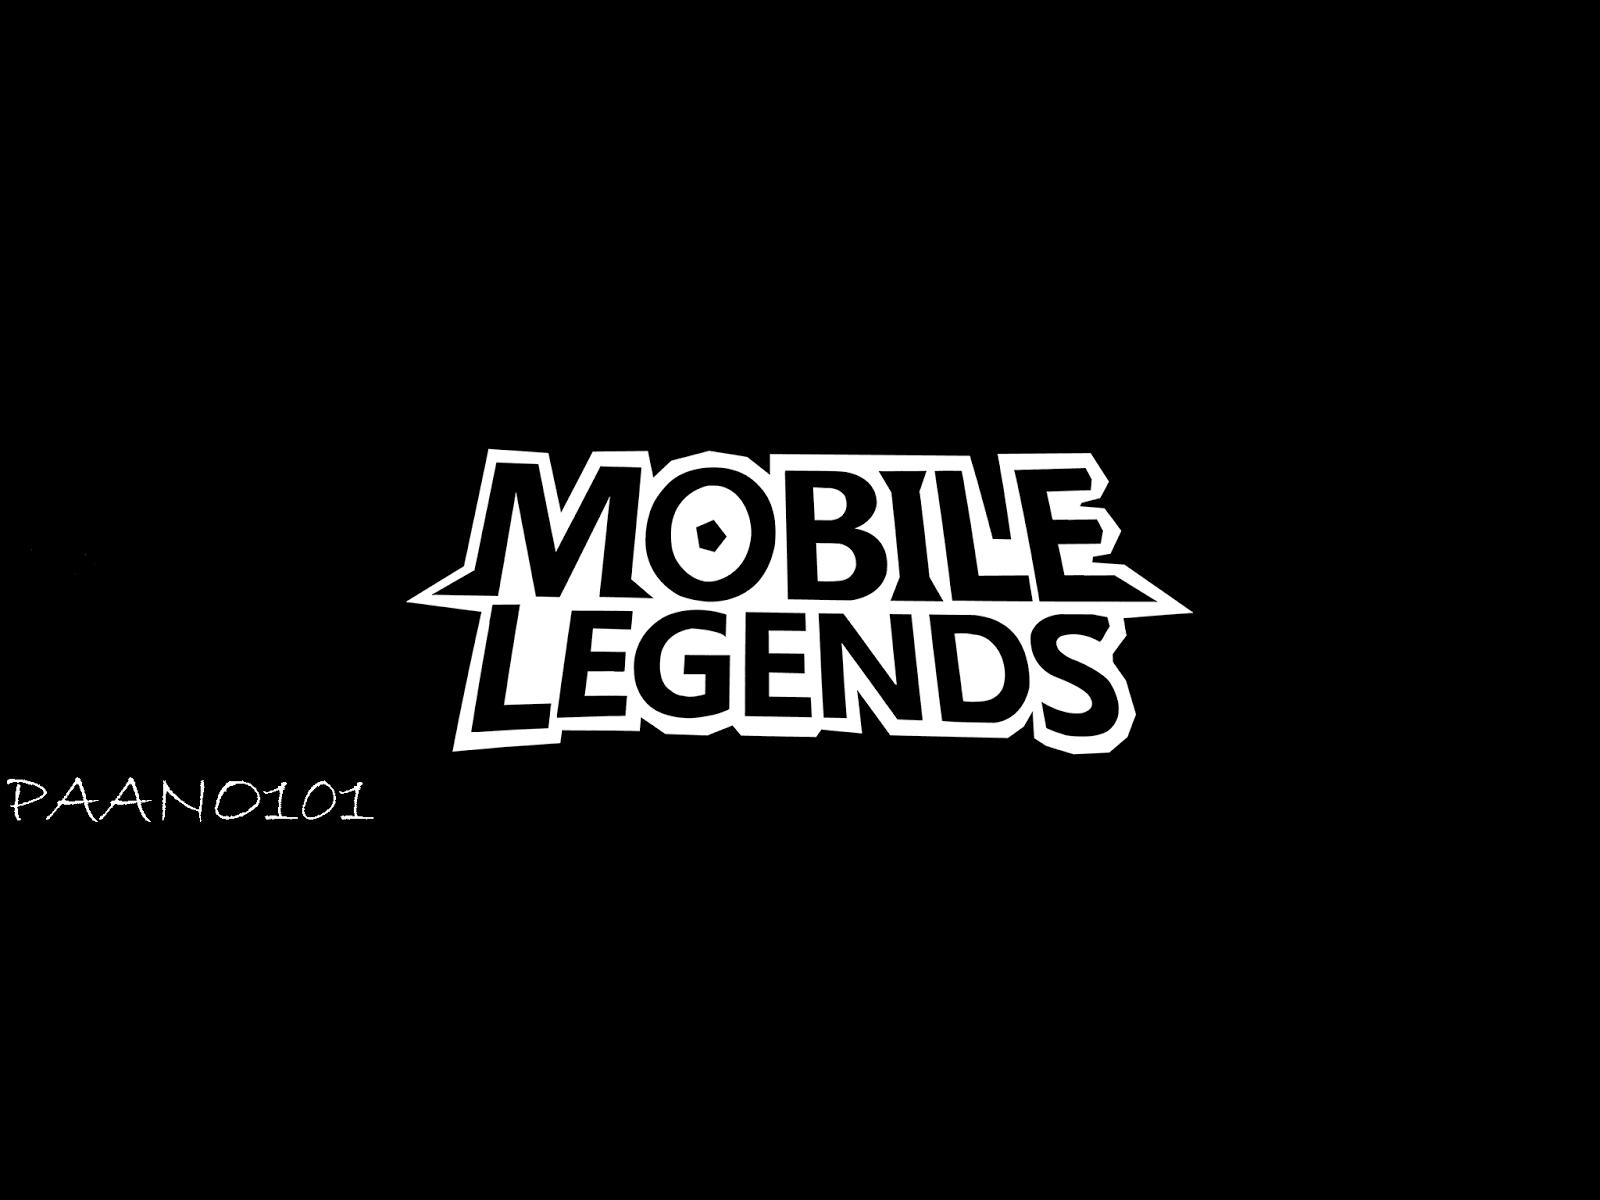 Mobile Legends Bang Bang Wallpapers Wallpaper Cave